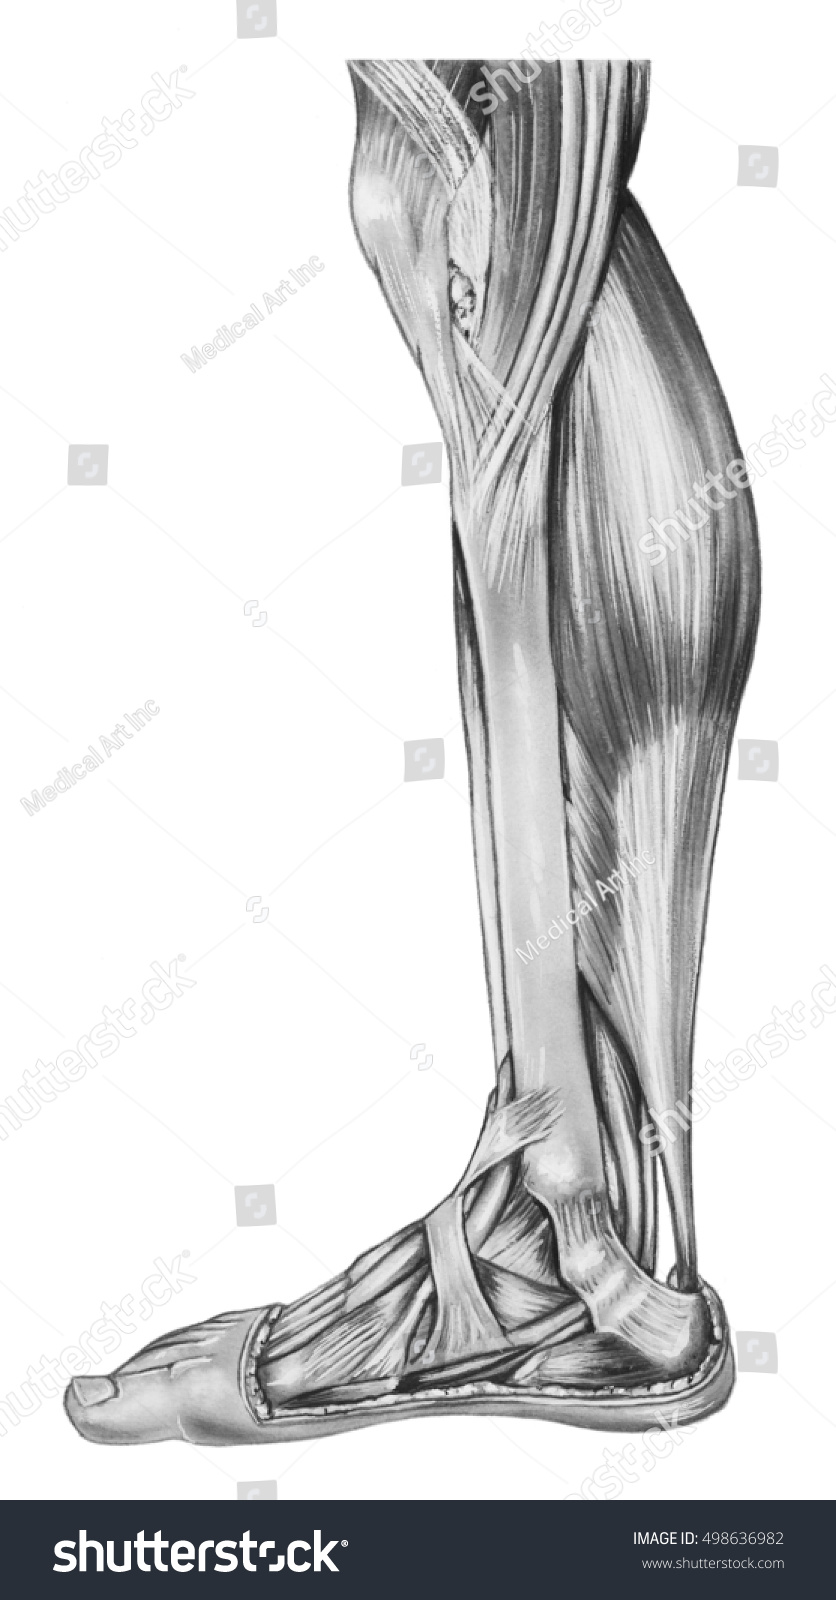 Leg Lower Anatomy Muscles Tendons Human Stock Illustration 498636982 ...